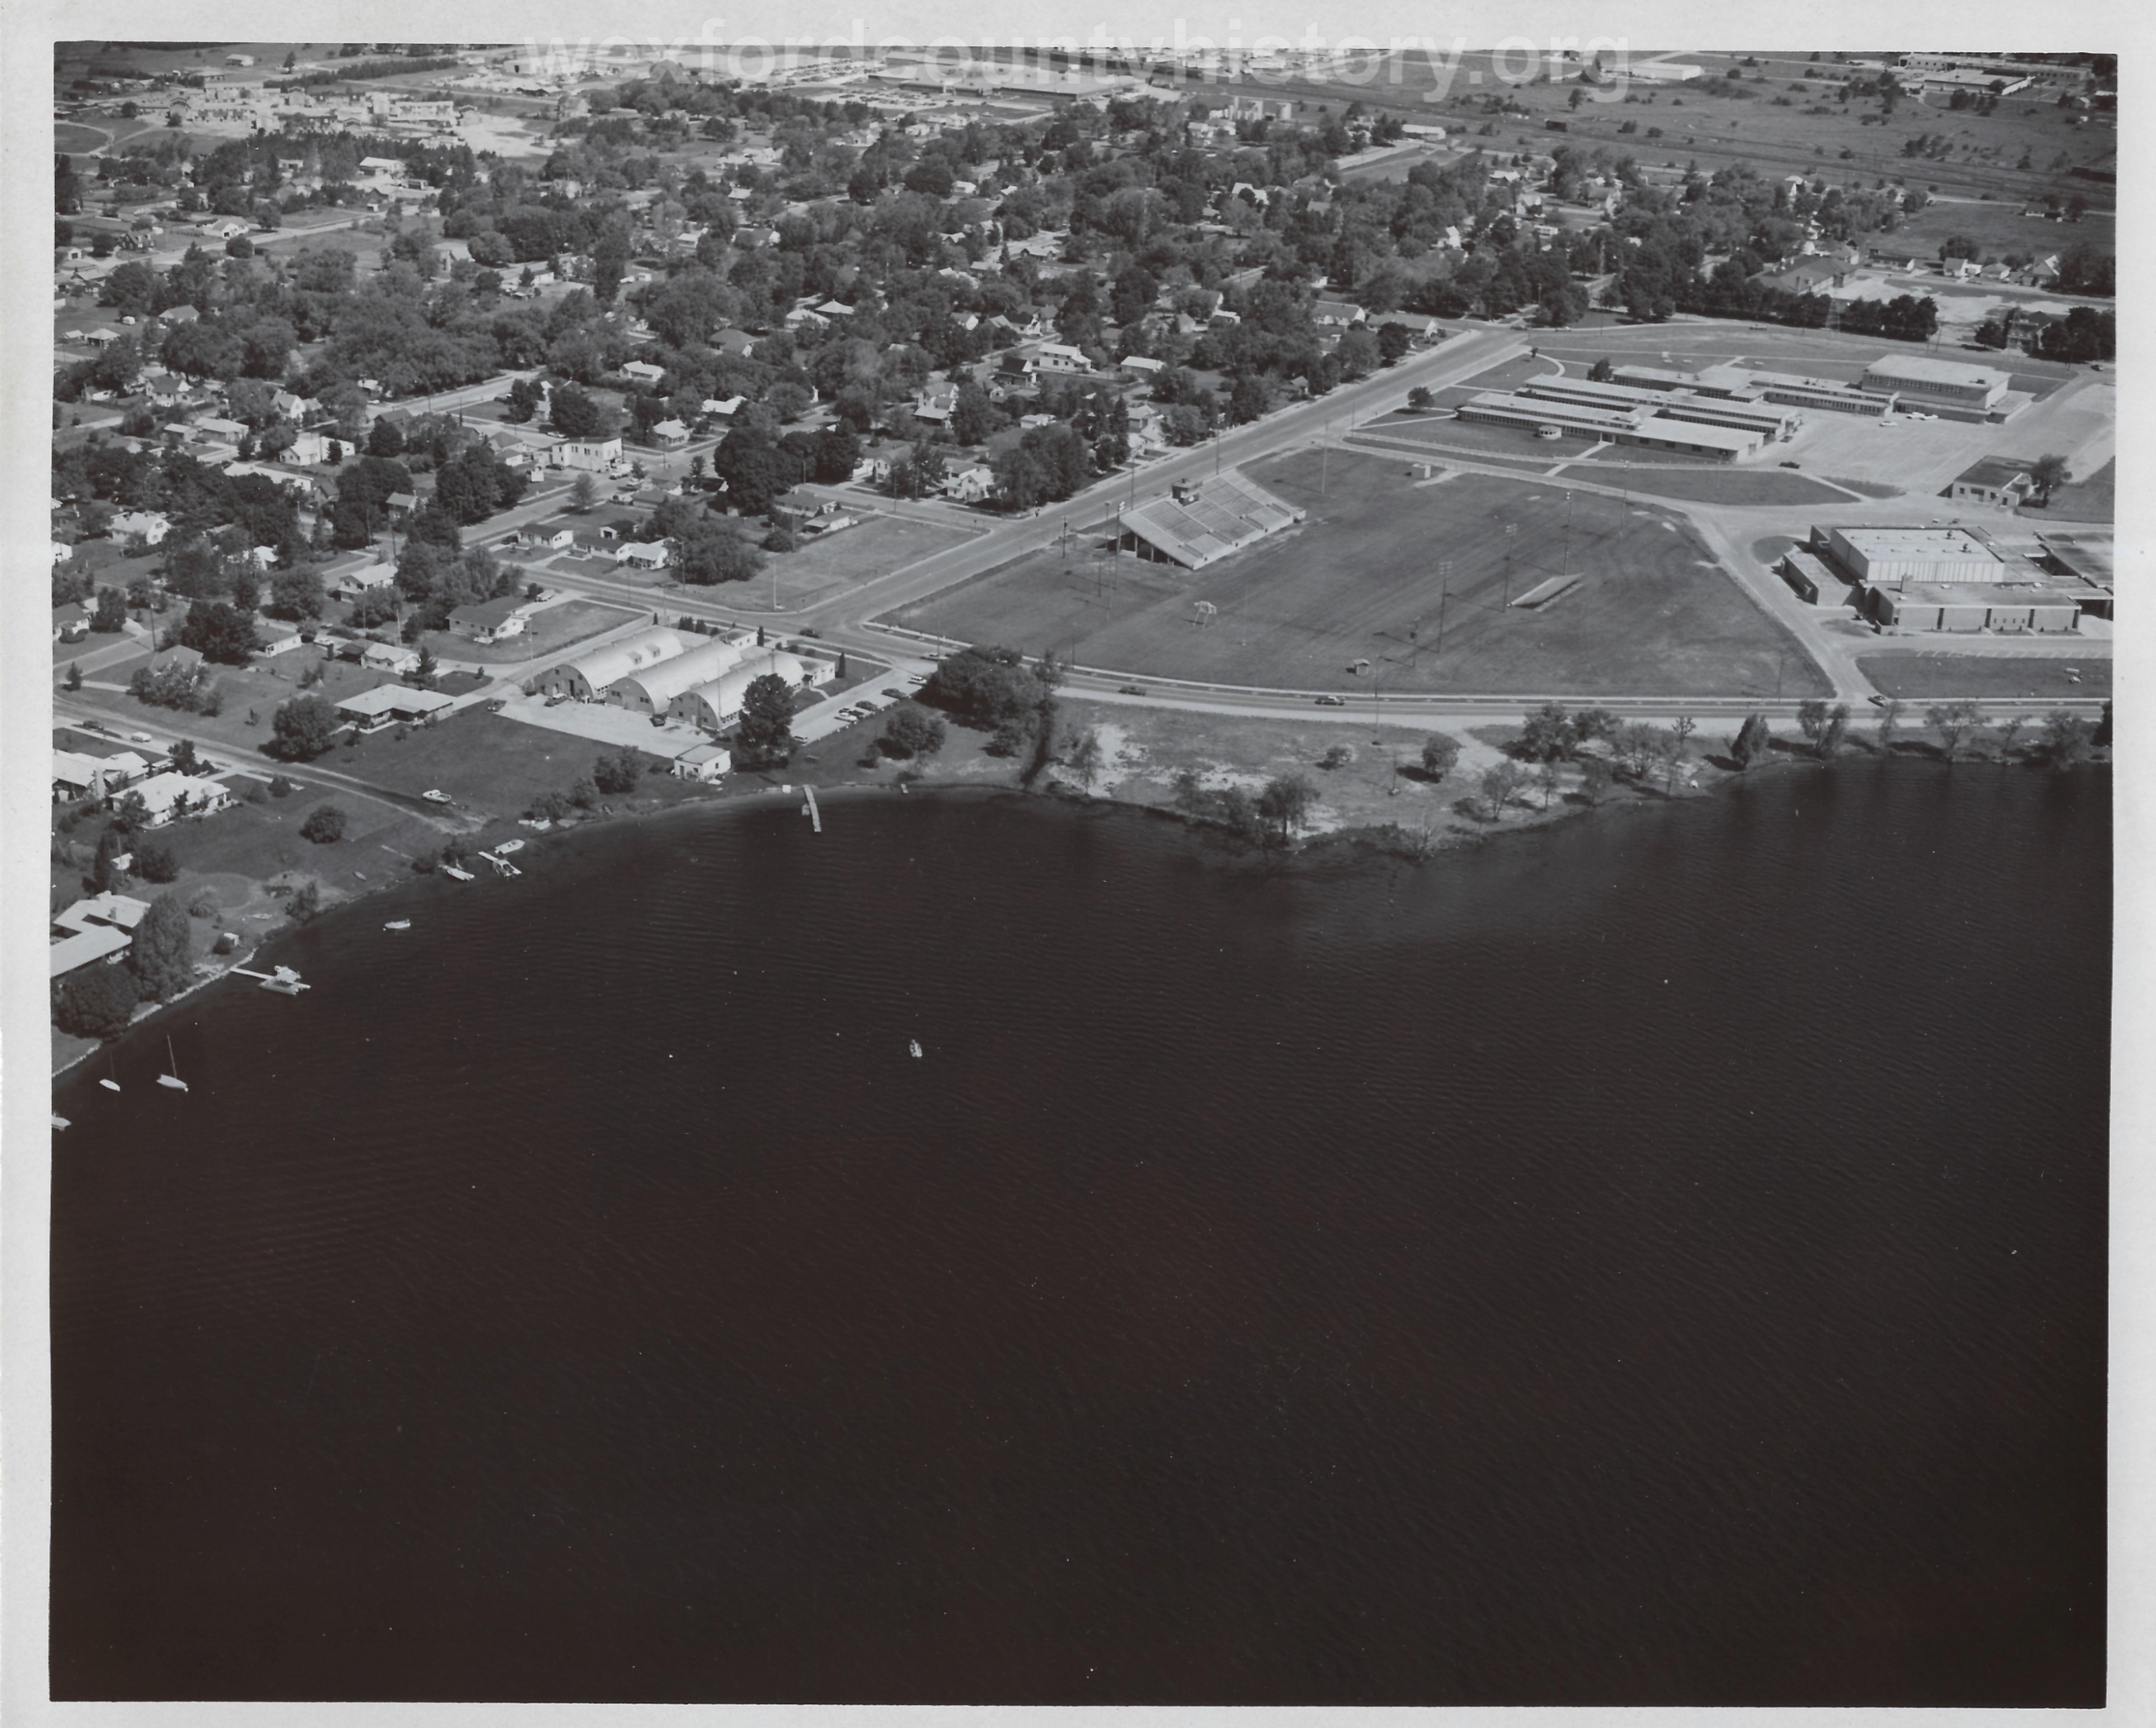 Veteran's Stadium, Naval Reserve, High School